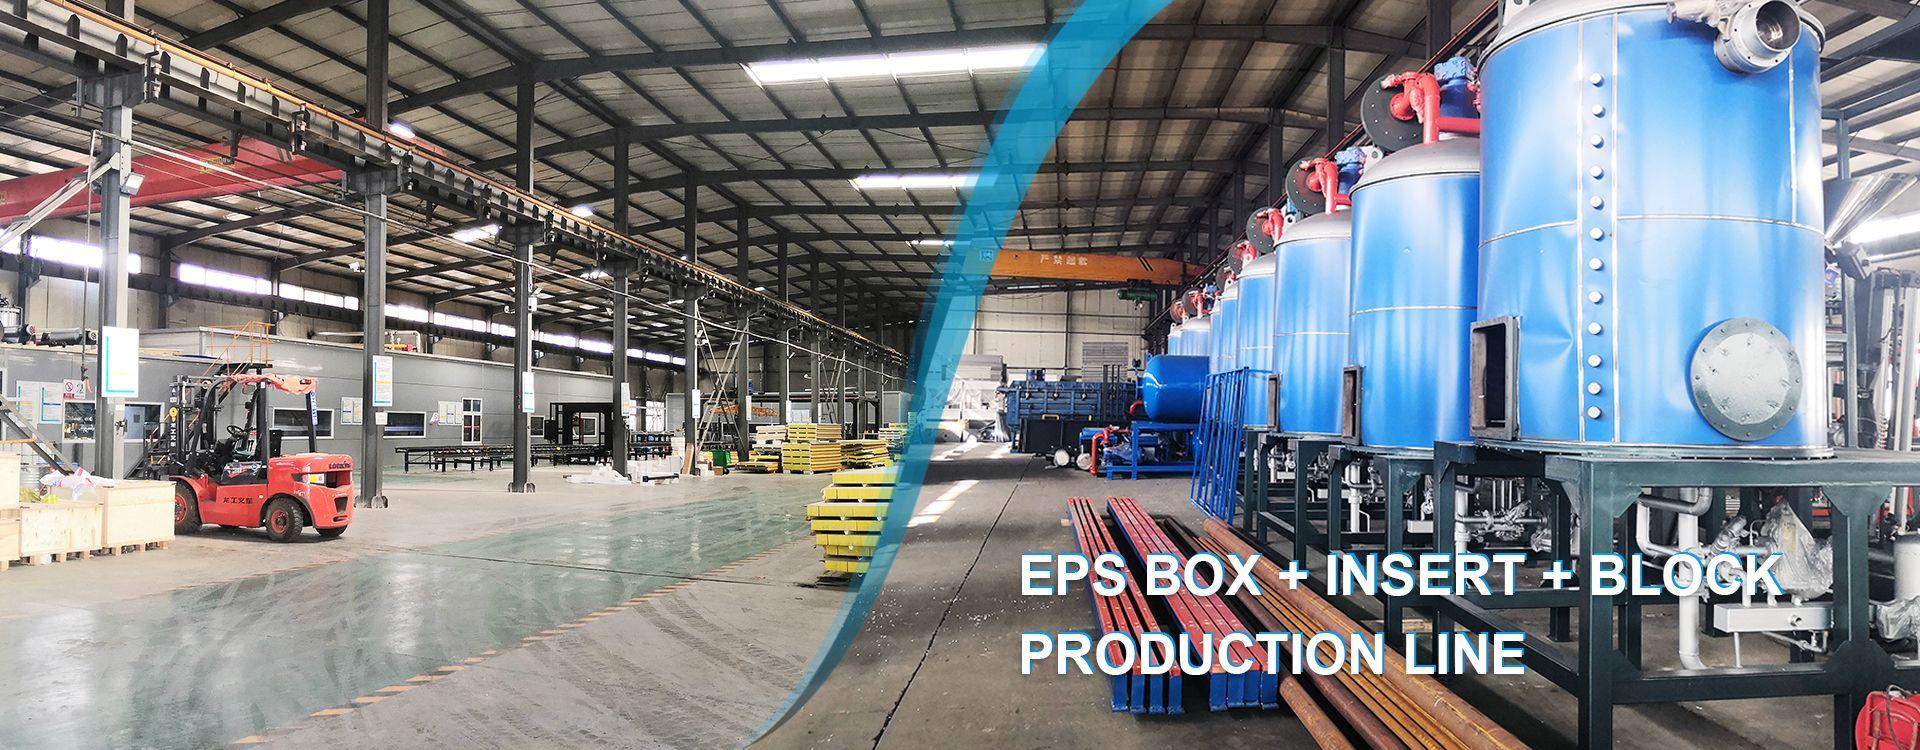 Building Materials Production Line